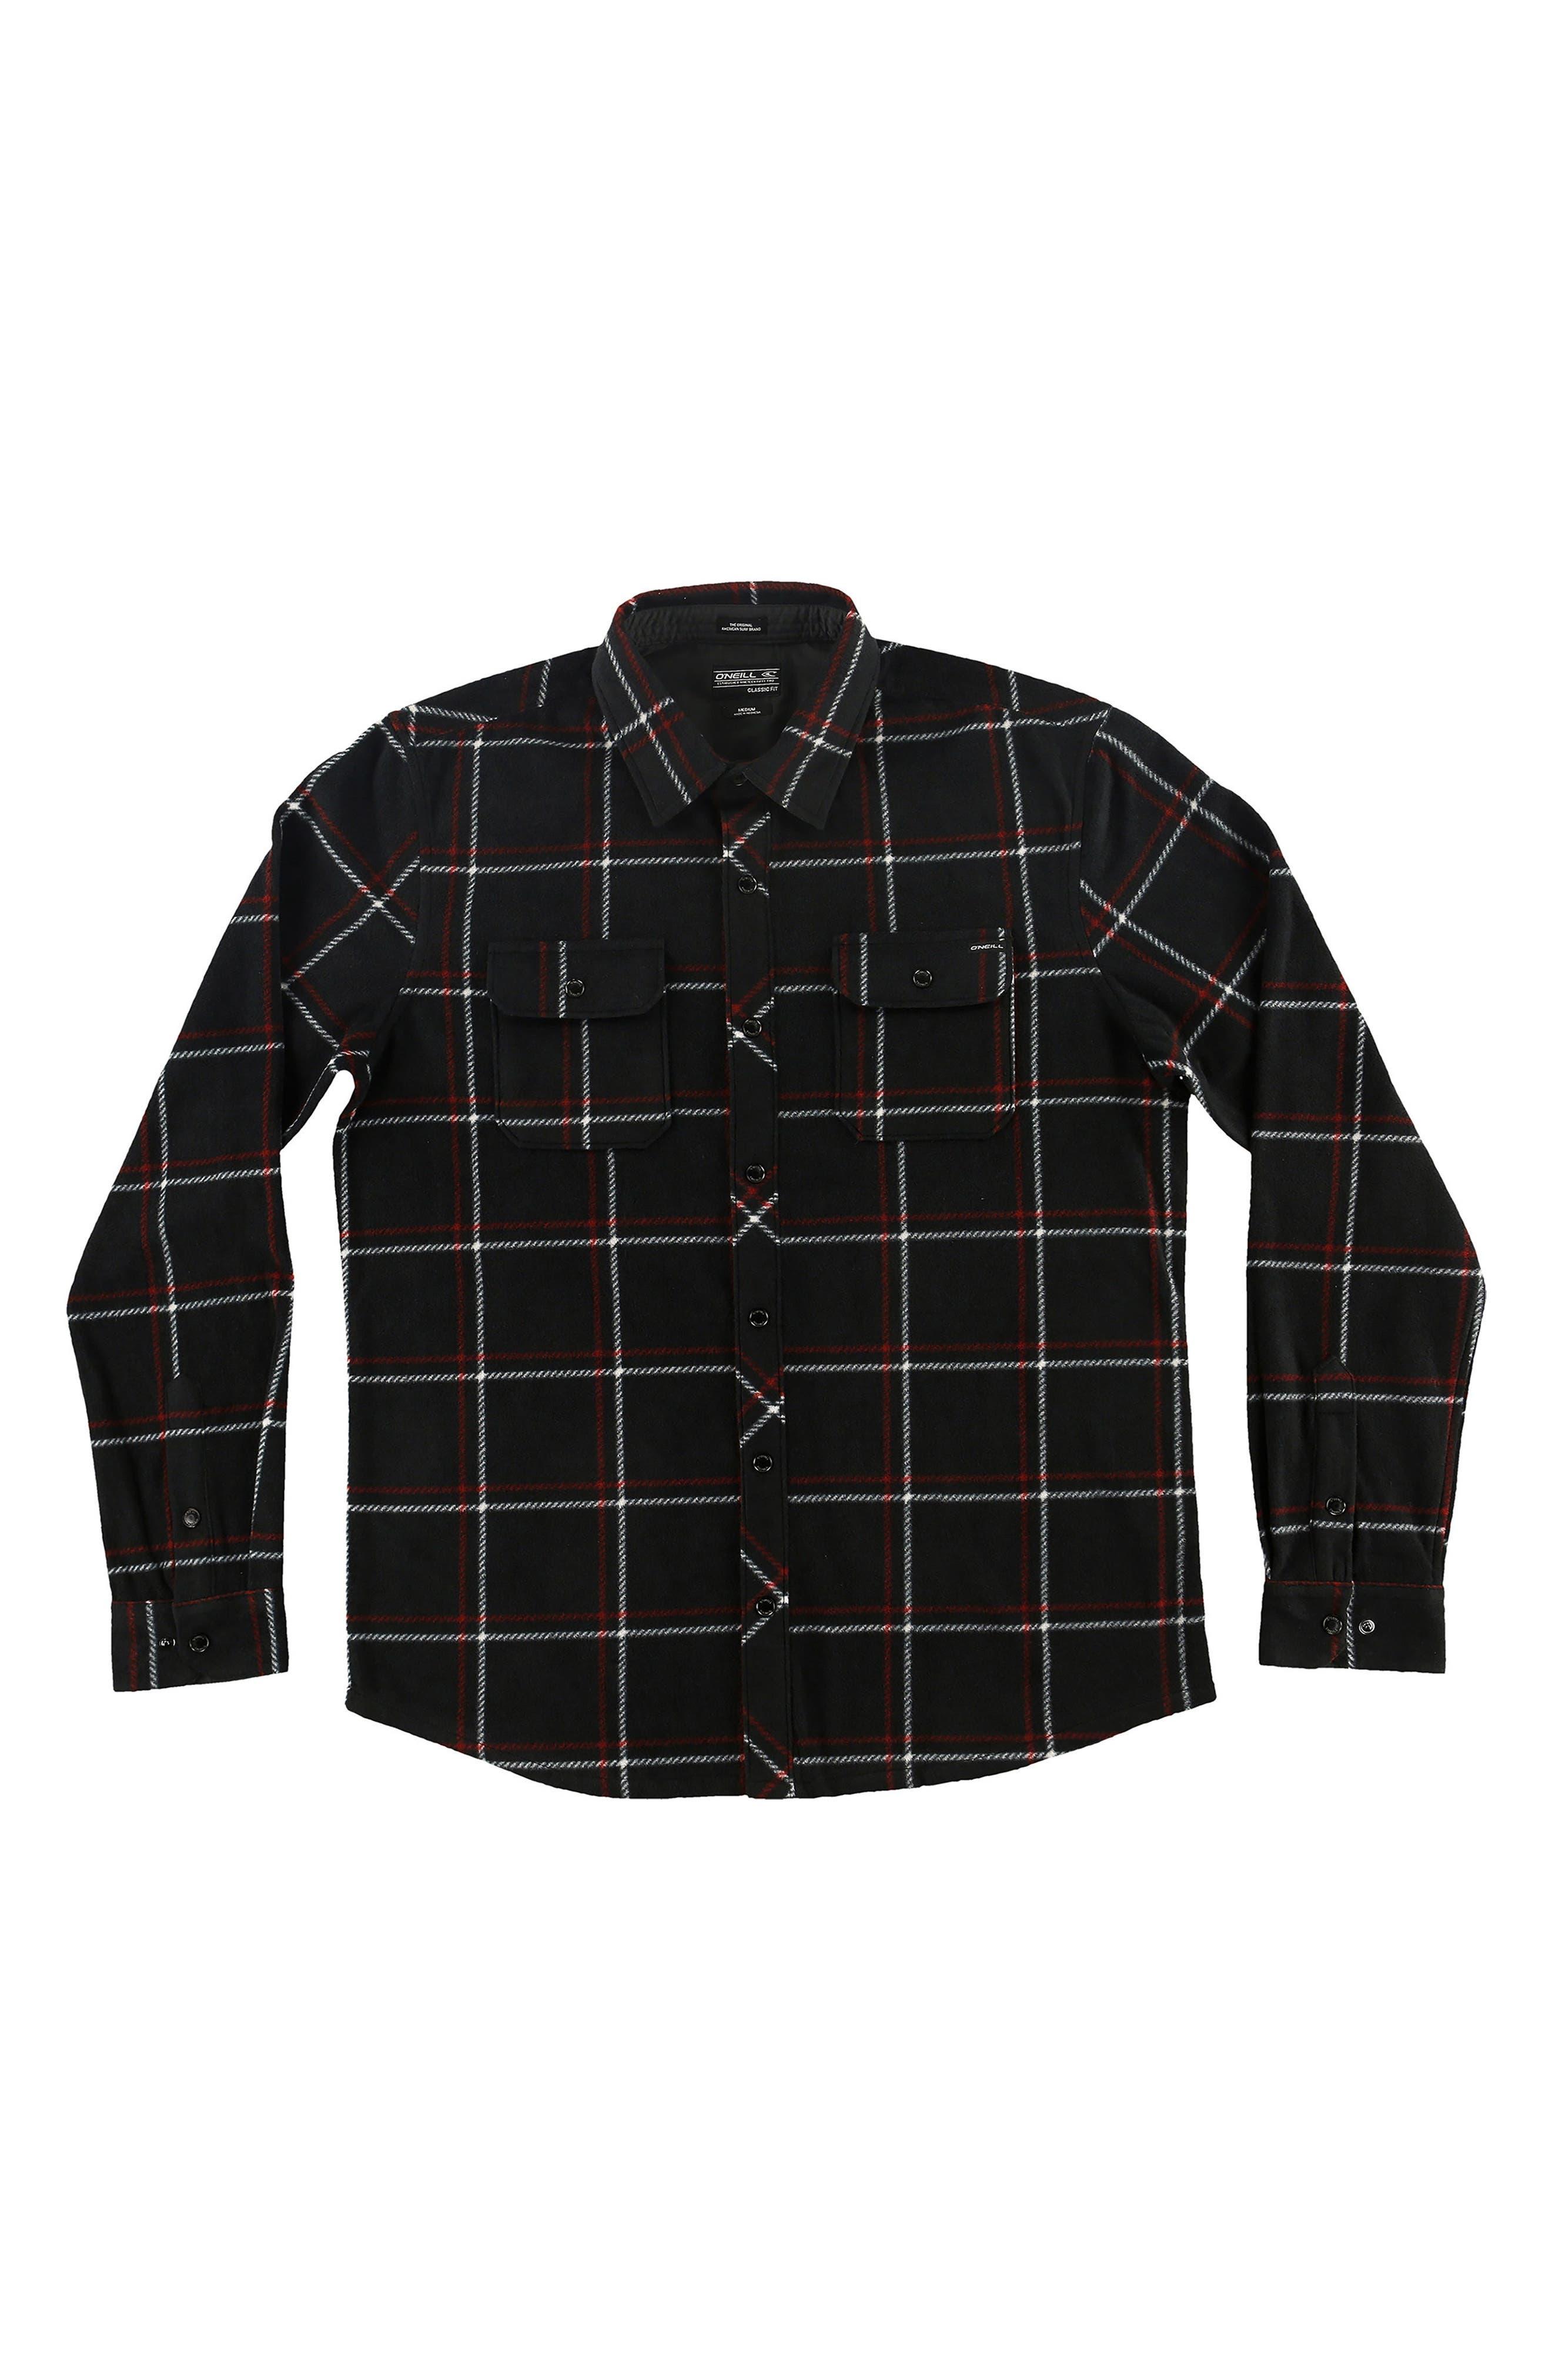 Glacier Series Two Plush Windowpane Shirt,                             Main thumbnail 1, color,                             Black